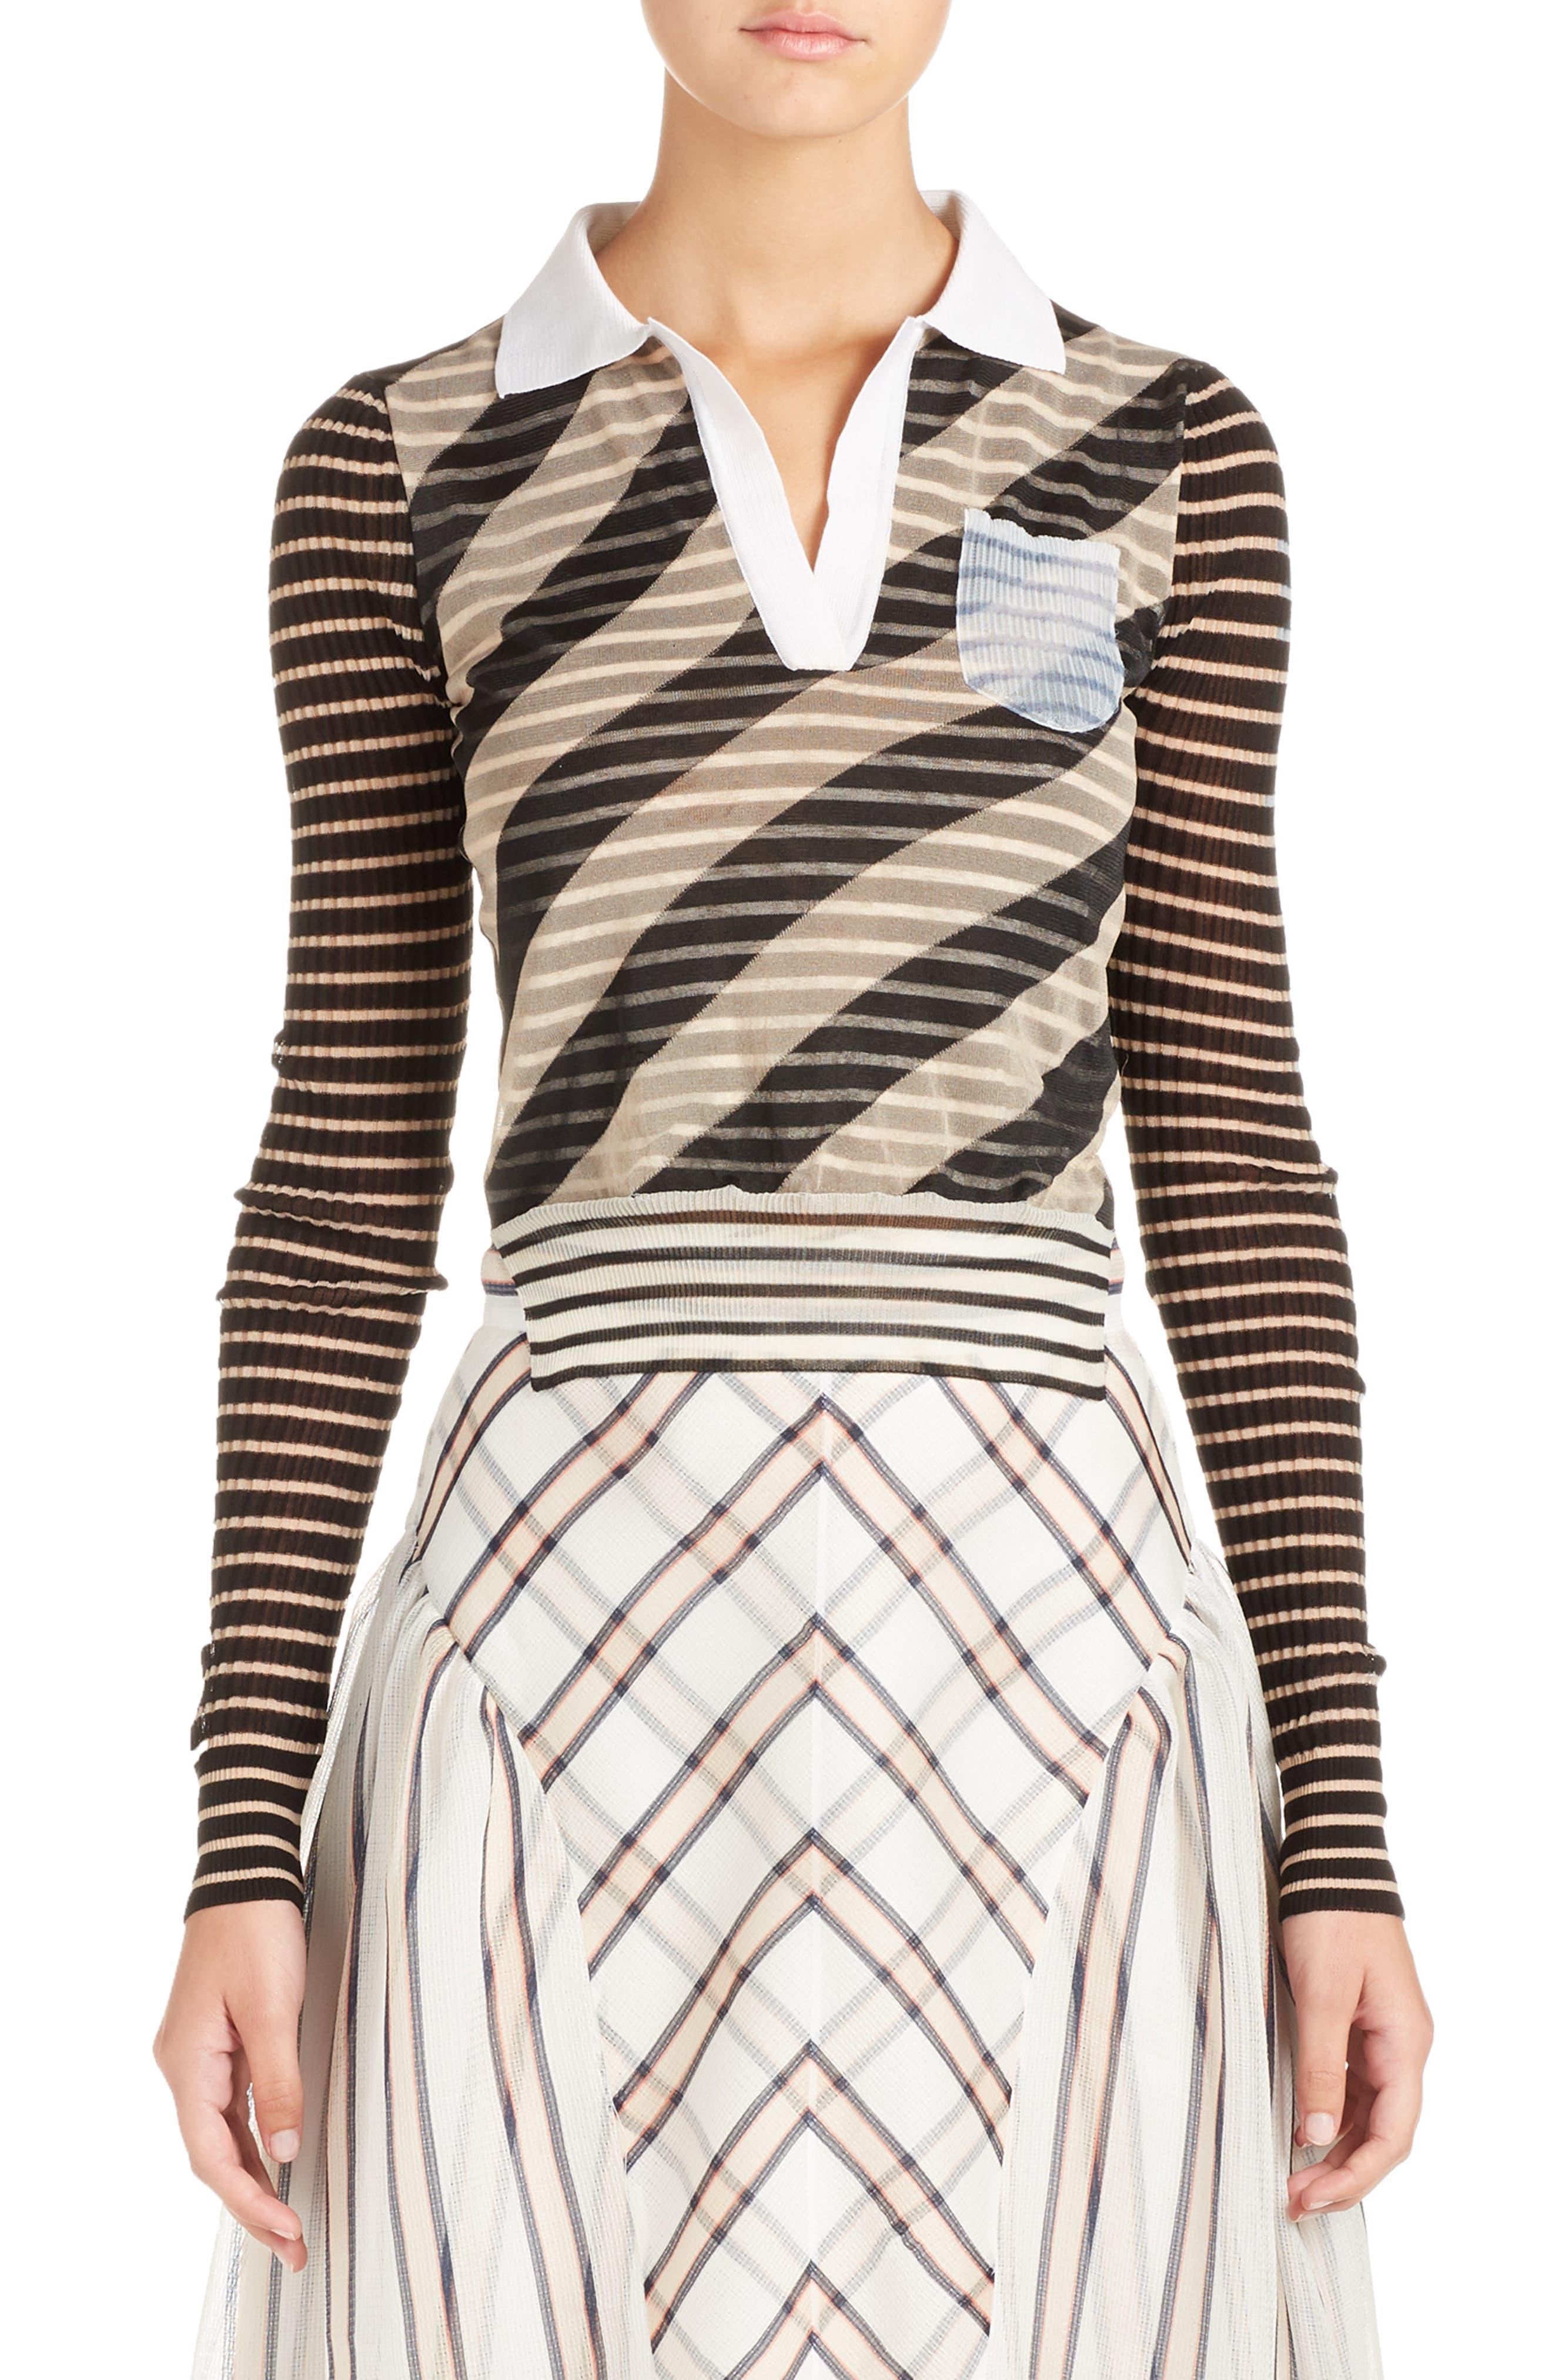 Mixed Stripe Top,                         Main,                         color, Nude/ Black